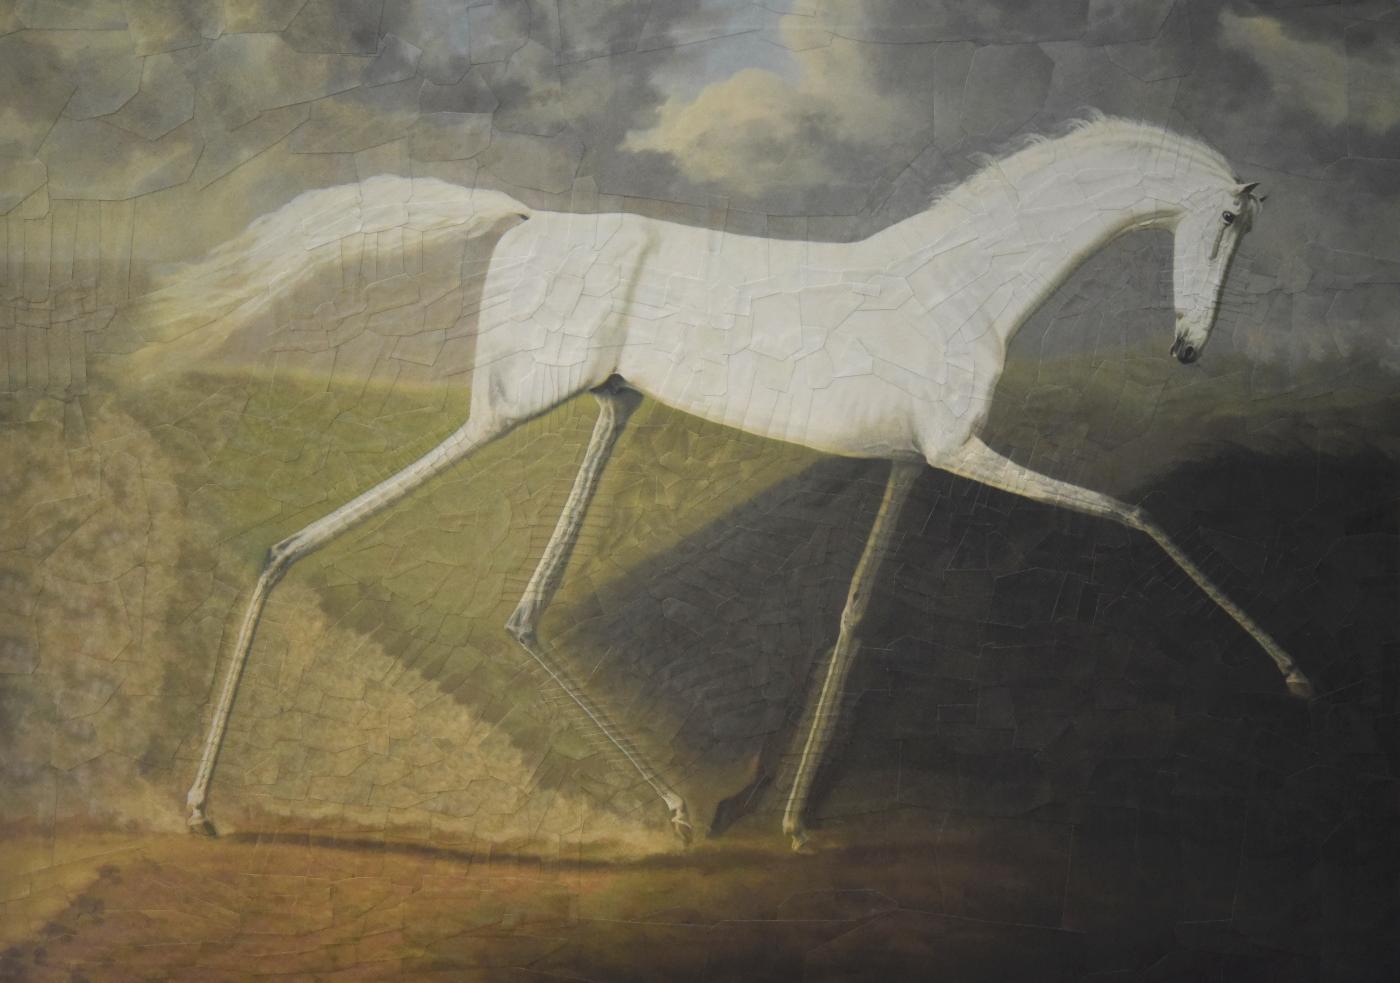 collage equestrian horse horse illustration Horse portrait horses ILLUSTRATION  paper collage